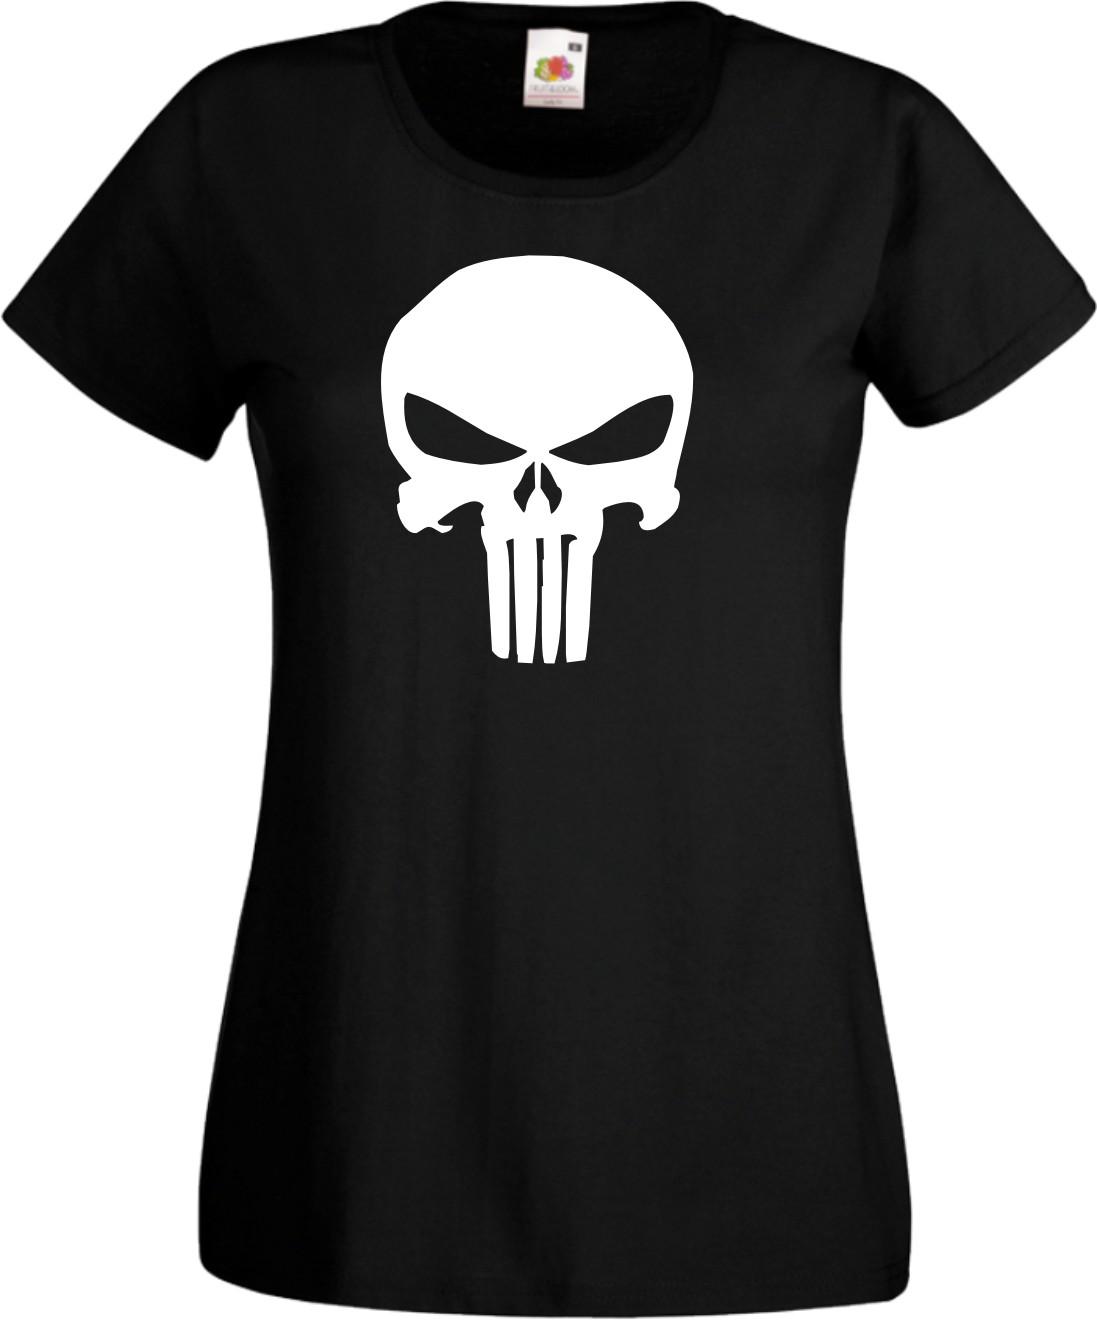 Punisher_damen_t_shirt_galerie.jpg